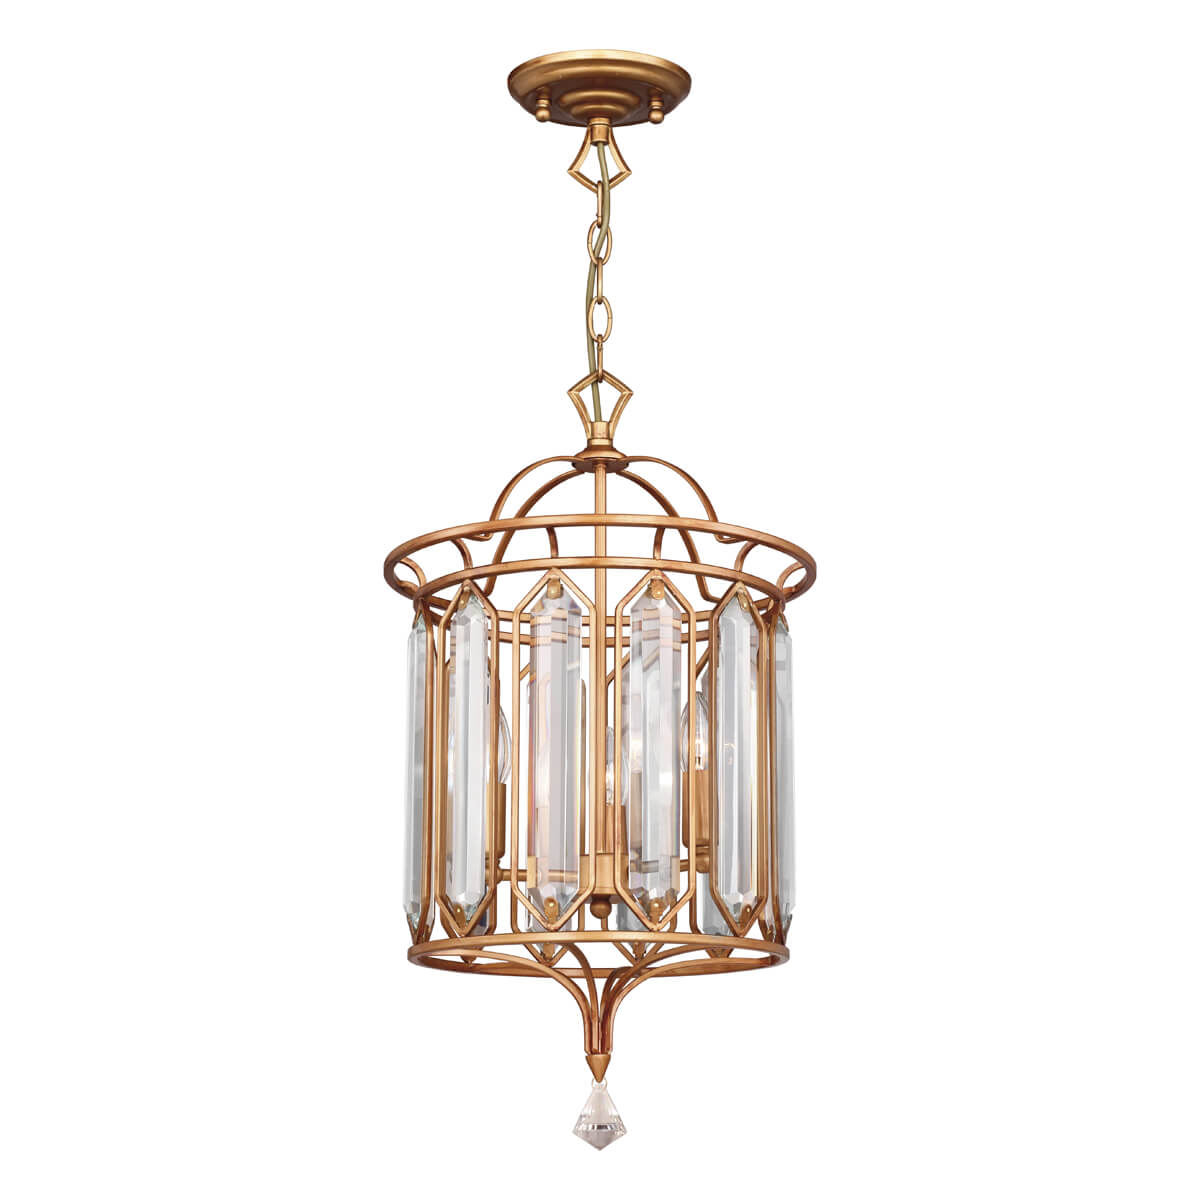 Люстра Favourite 2021-3P Royalty favourite подвесной светильник favourite royalty 2021 3p